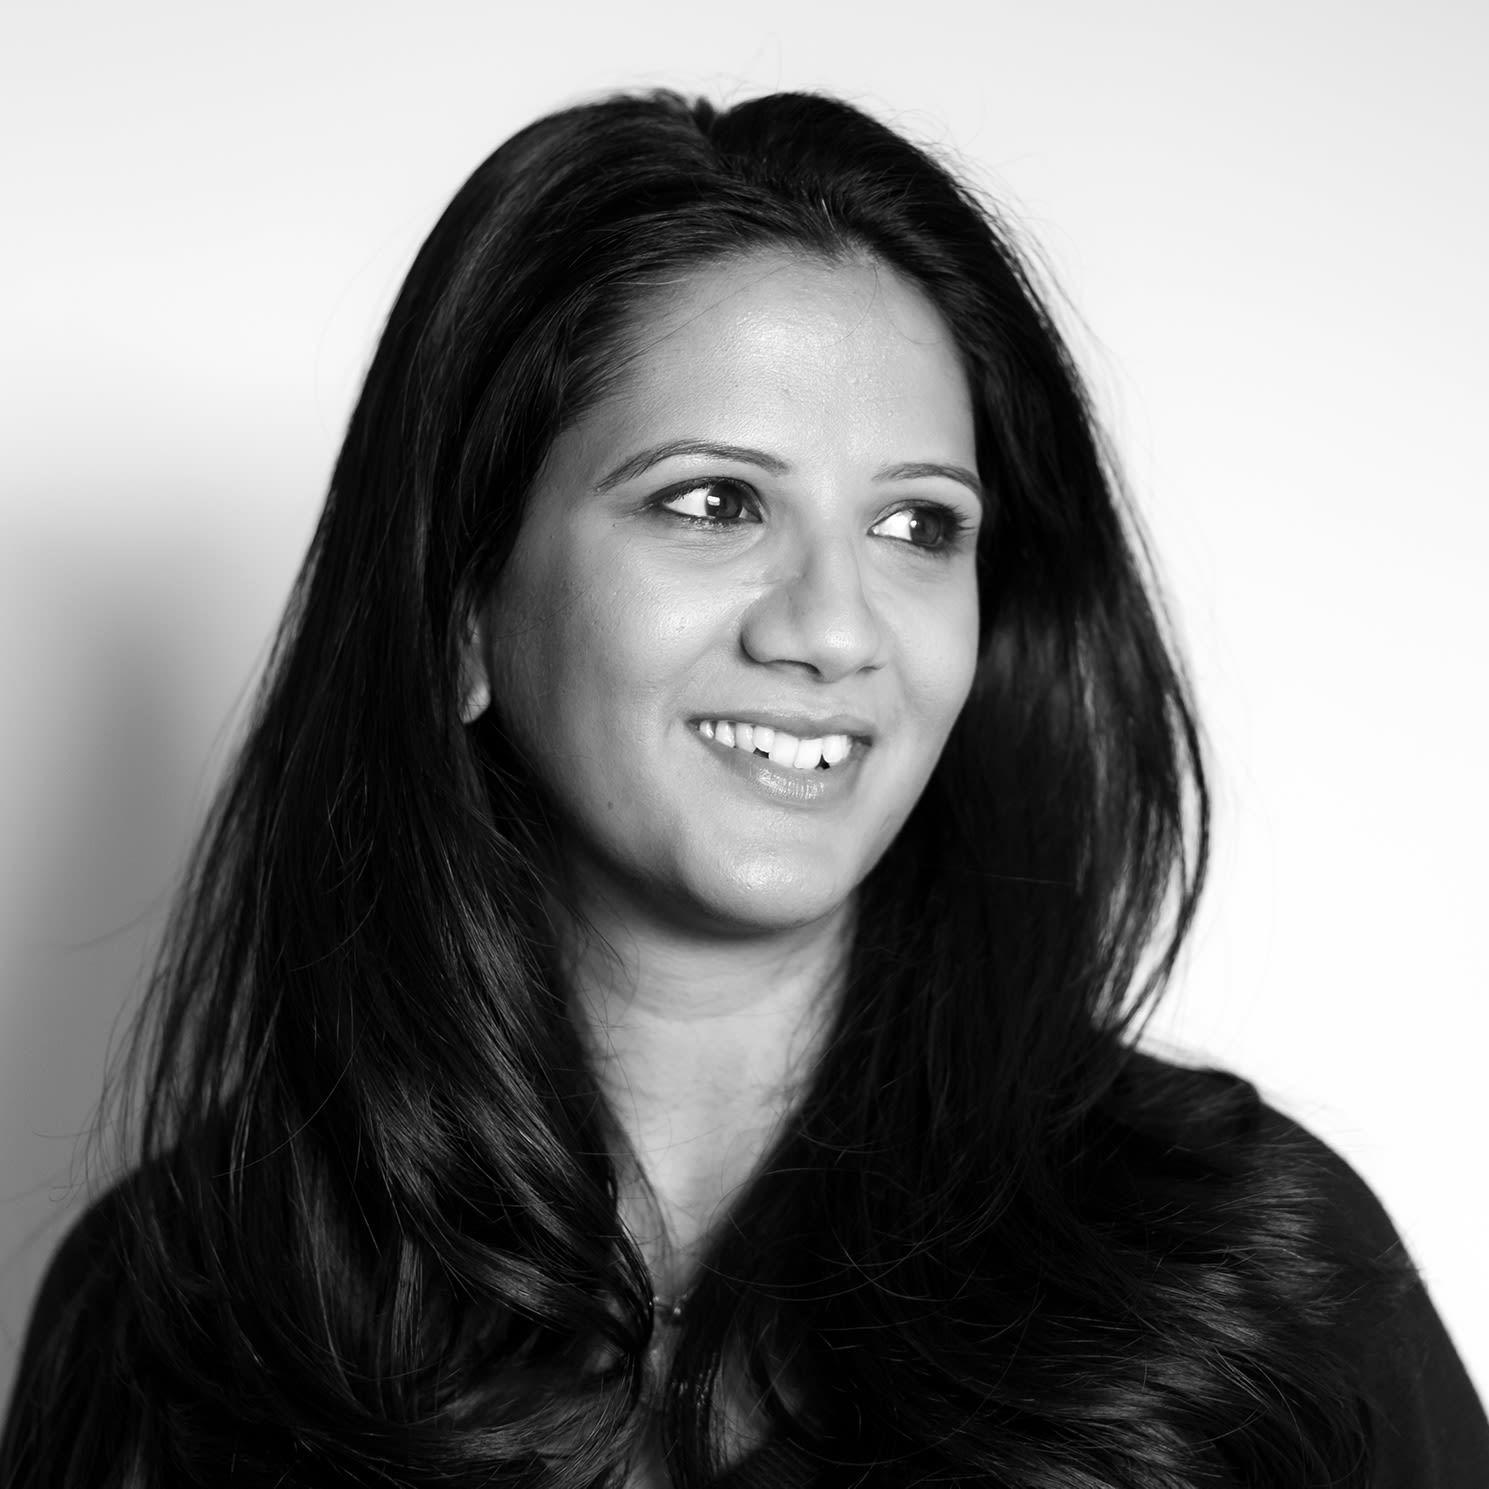 Profile photo of Shrina Shah, Global Head of Legal at Essence